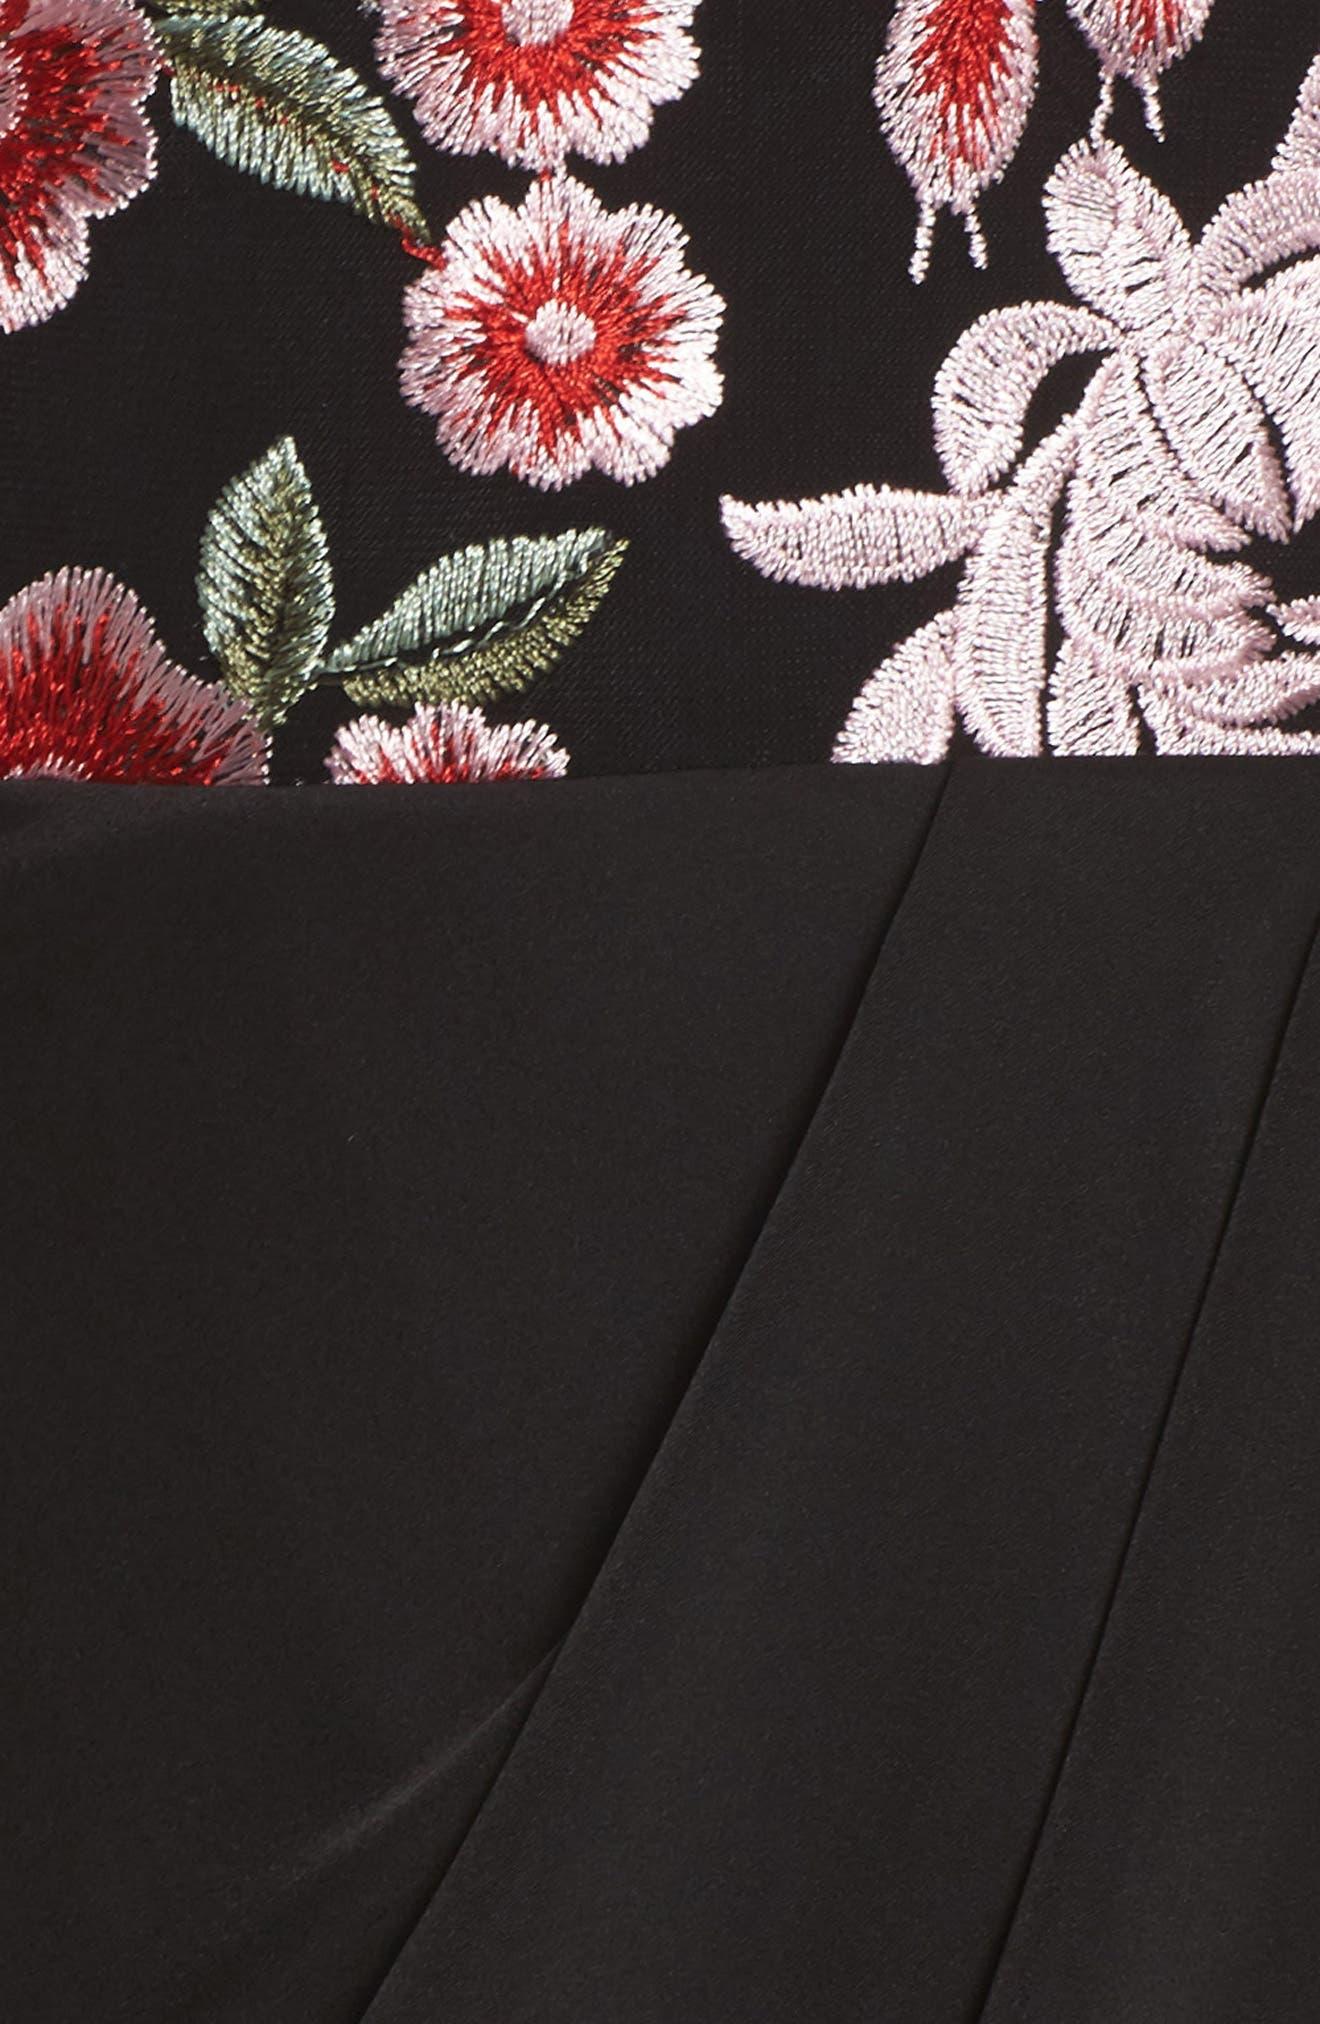 Mila Embroidered Tulip Skirt Dress,                             Alternate thumbnail 5, color,                             001